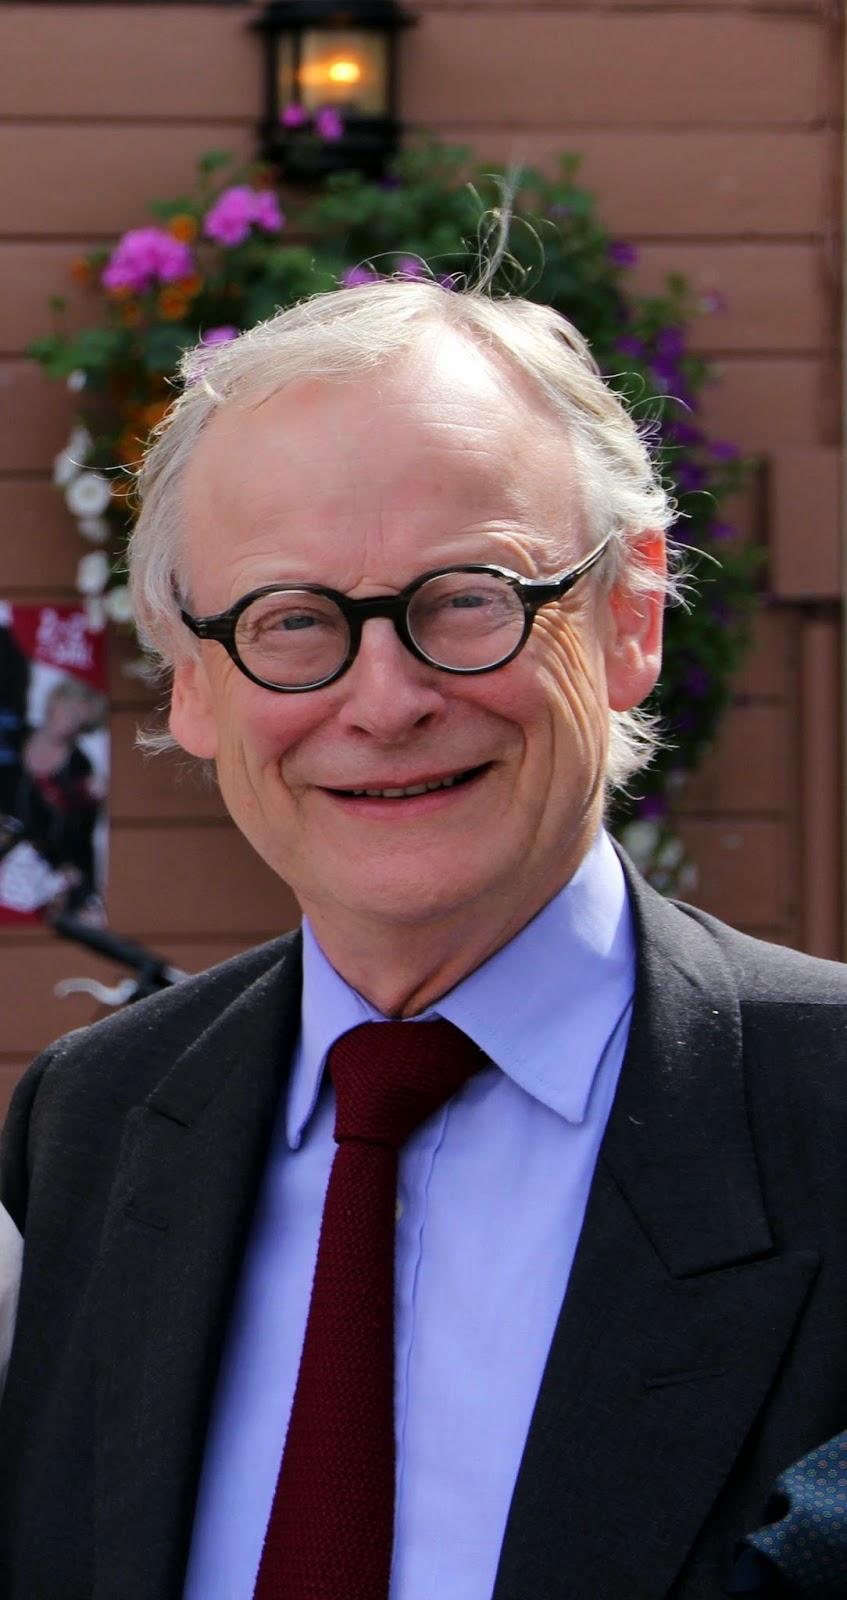 John Gummer aka Lord Deben.